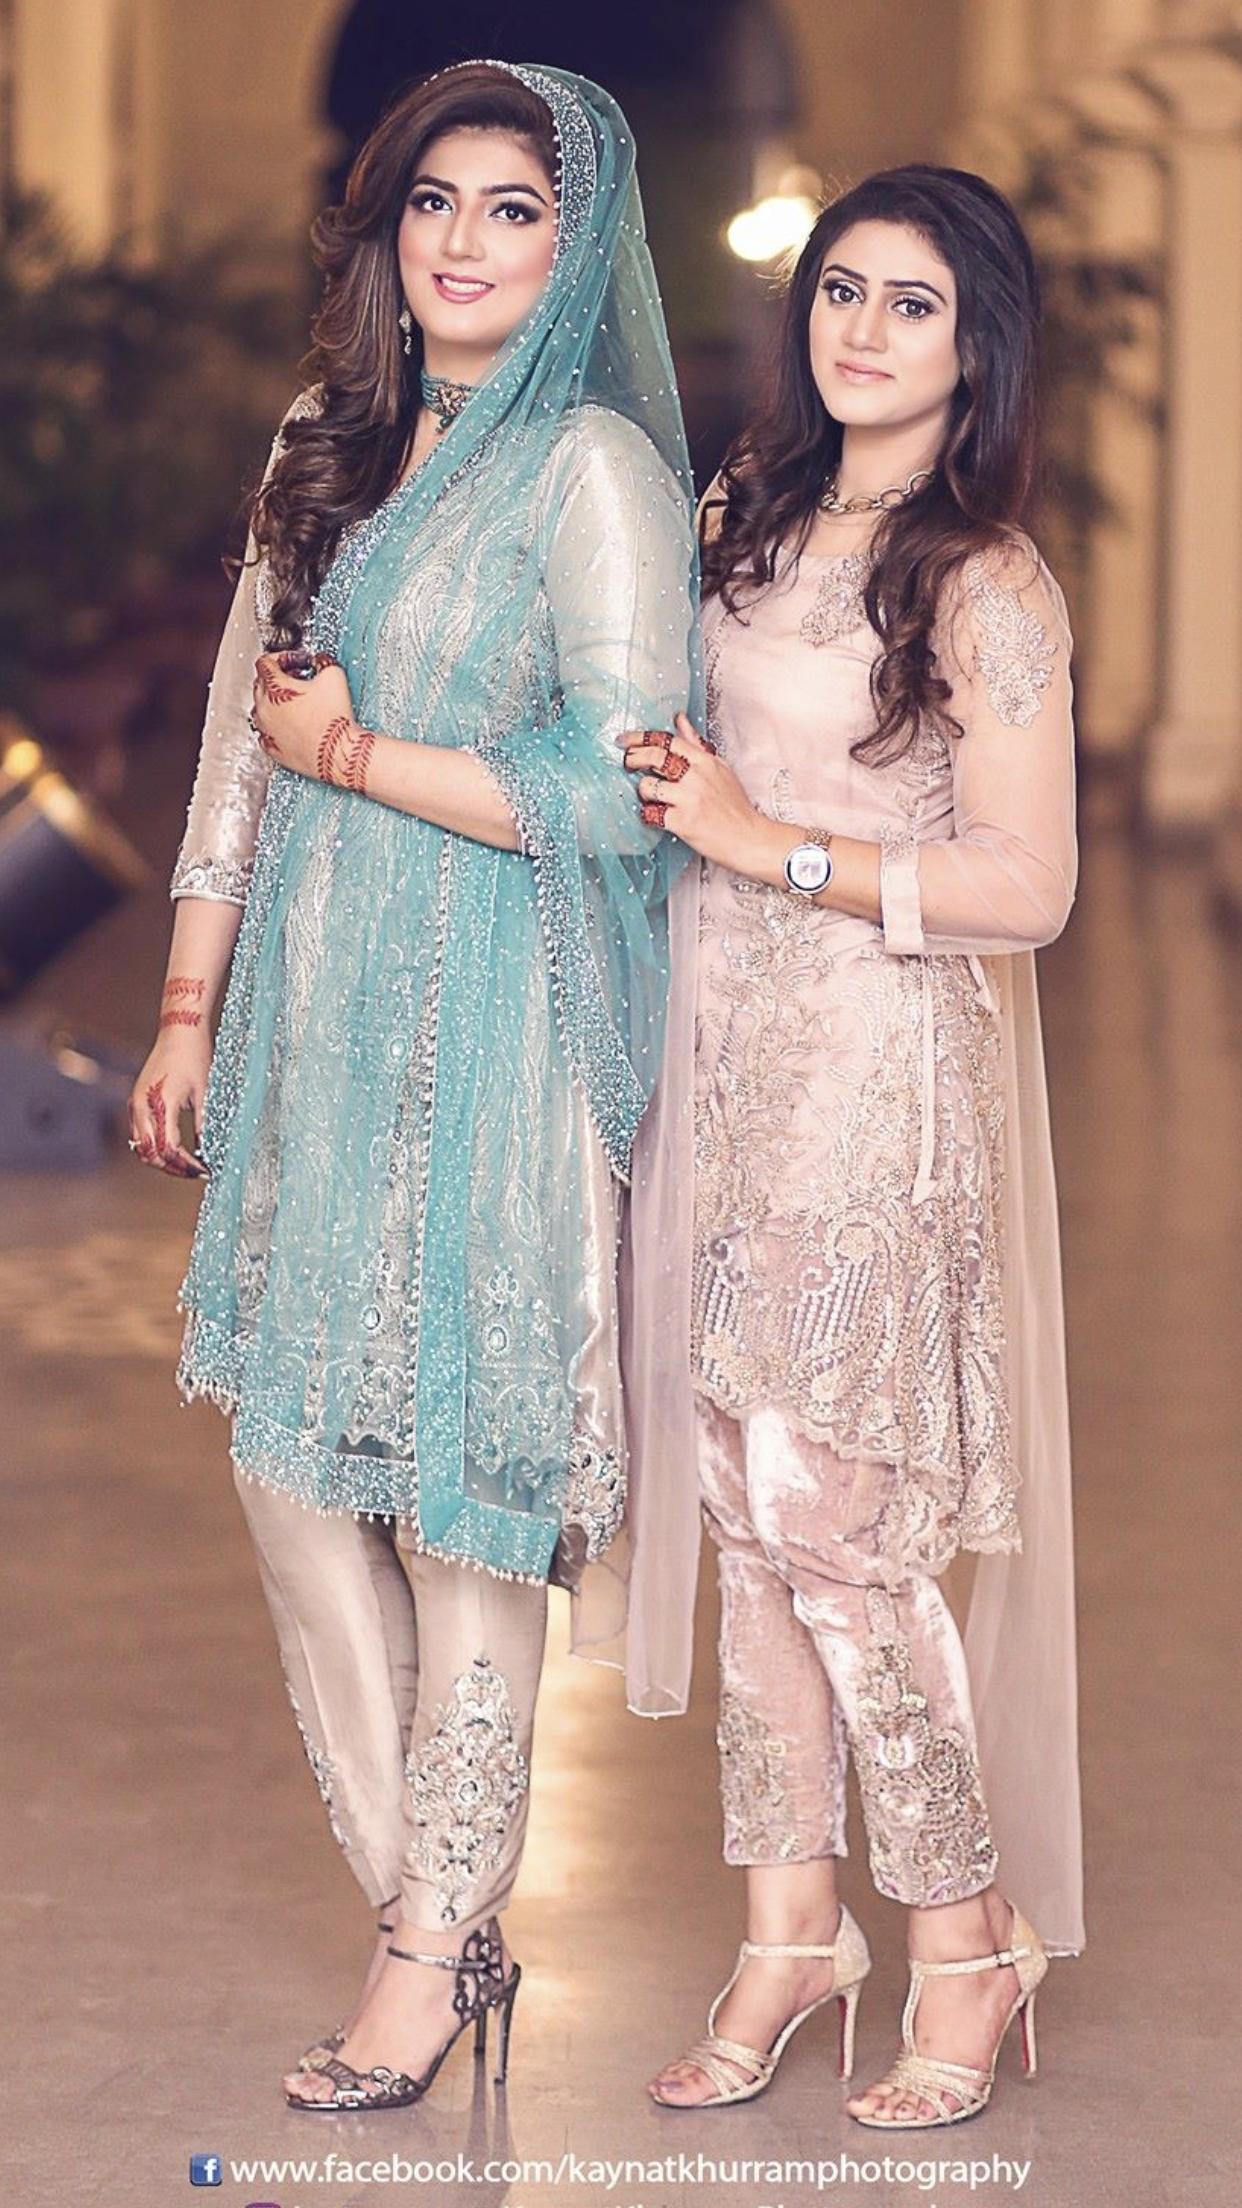 e9e7dab2c9f Baat paki bride with her friend Latest Pakistani Dresses